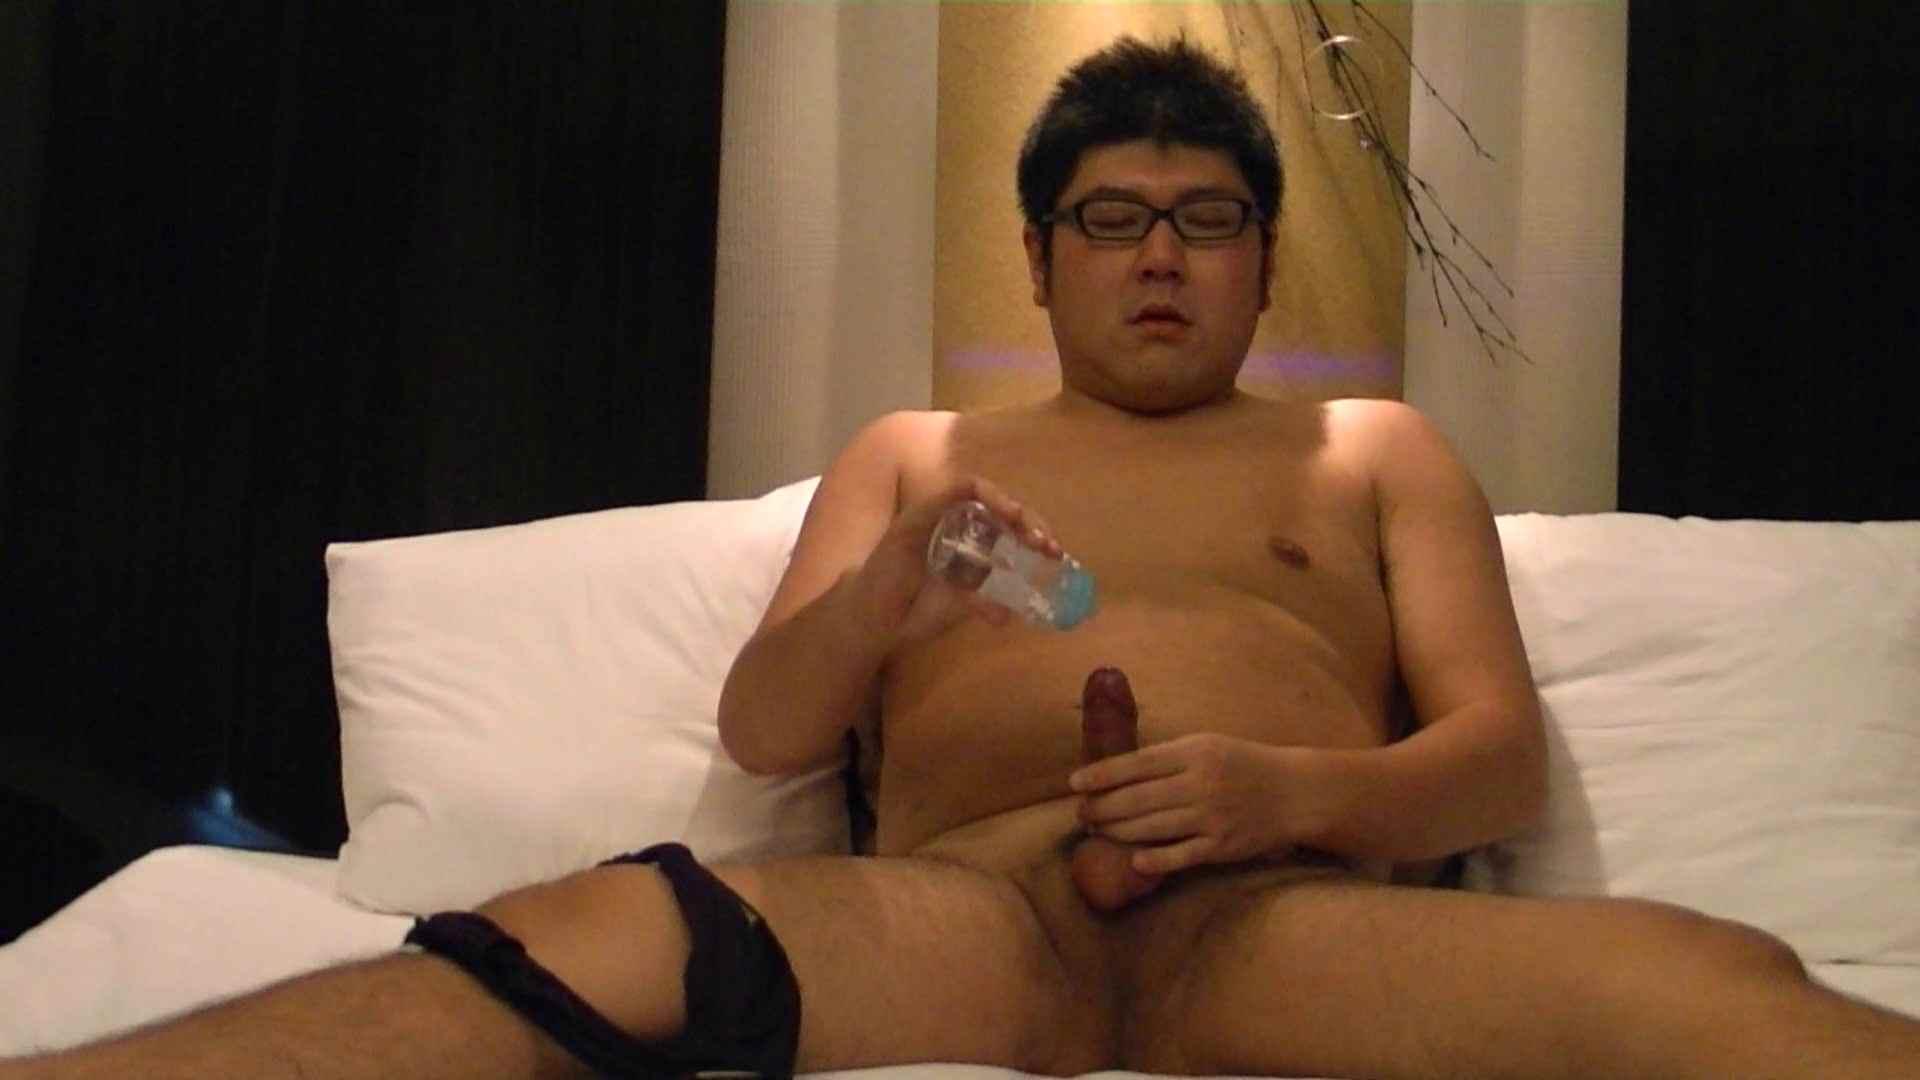 Mr.オナックスさん投稿!HD 貴方のオナニー三万円で撮影させてください。VOL.02 前編 0 | オナニー特集  72pic 65